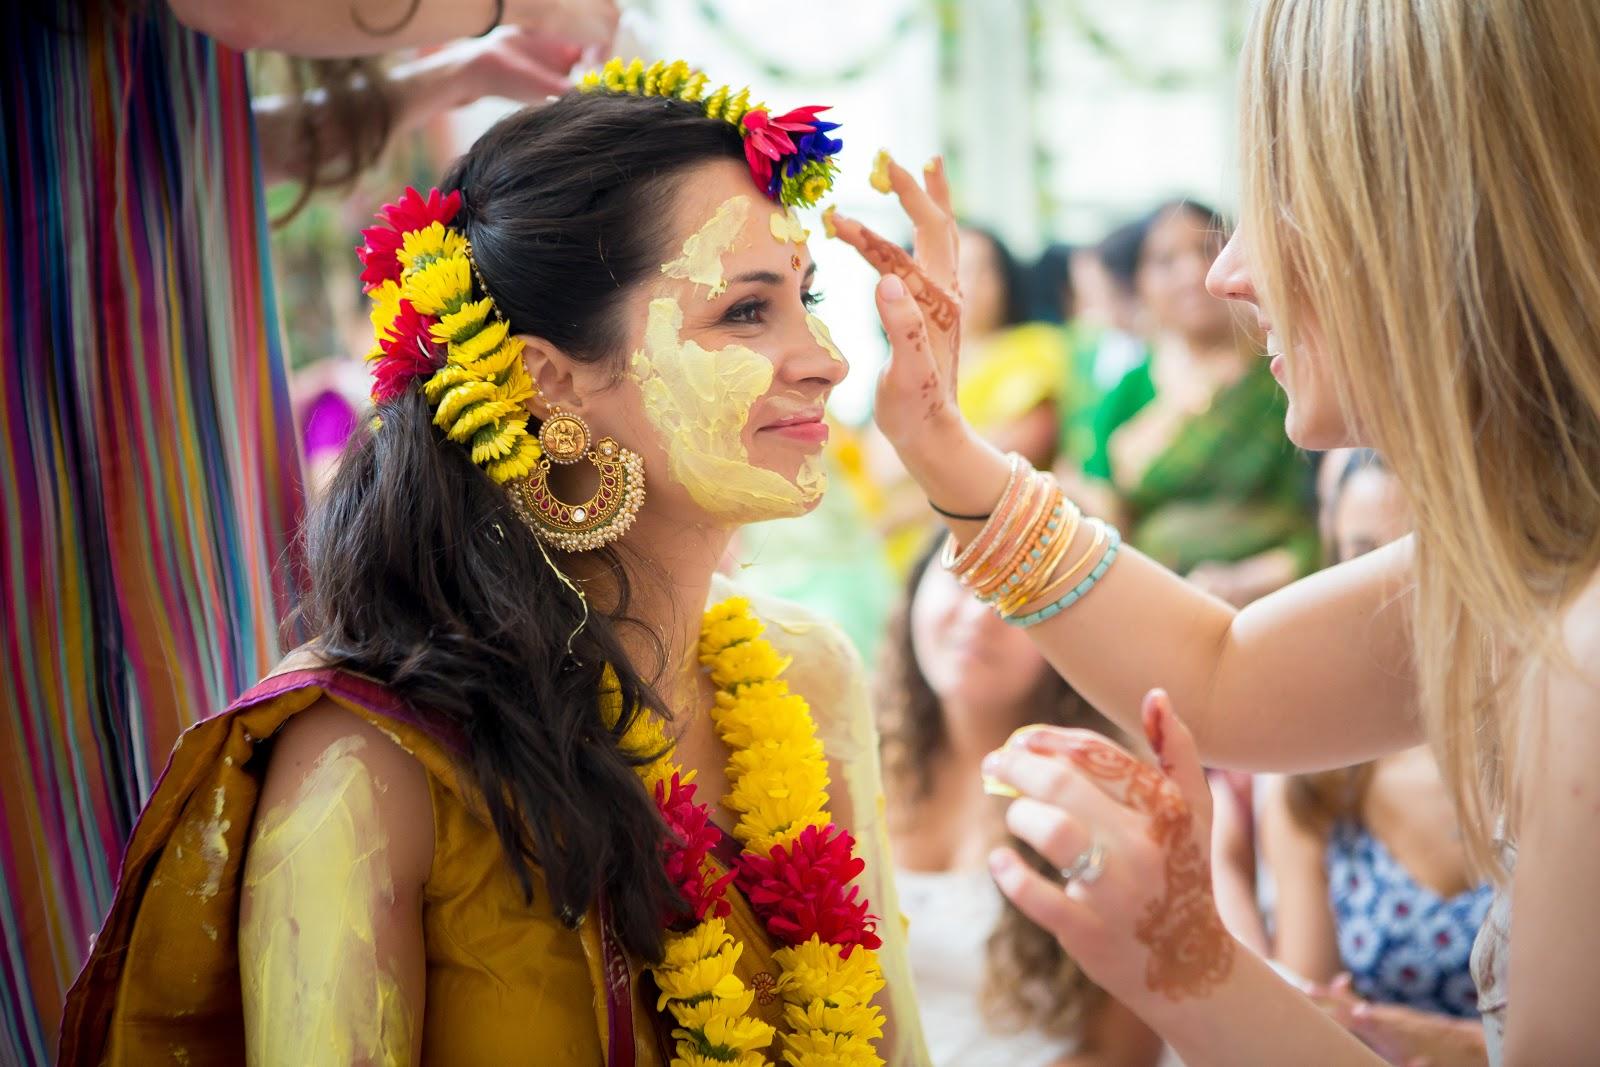 10 Best Pre-Bridal Beauty Treatments: Indian Weddings Checklist